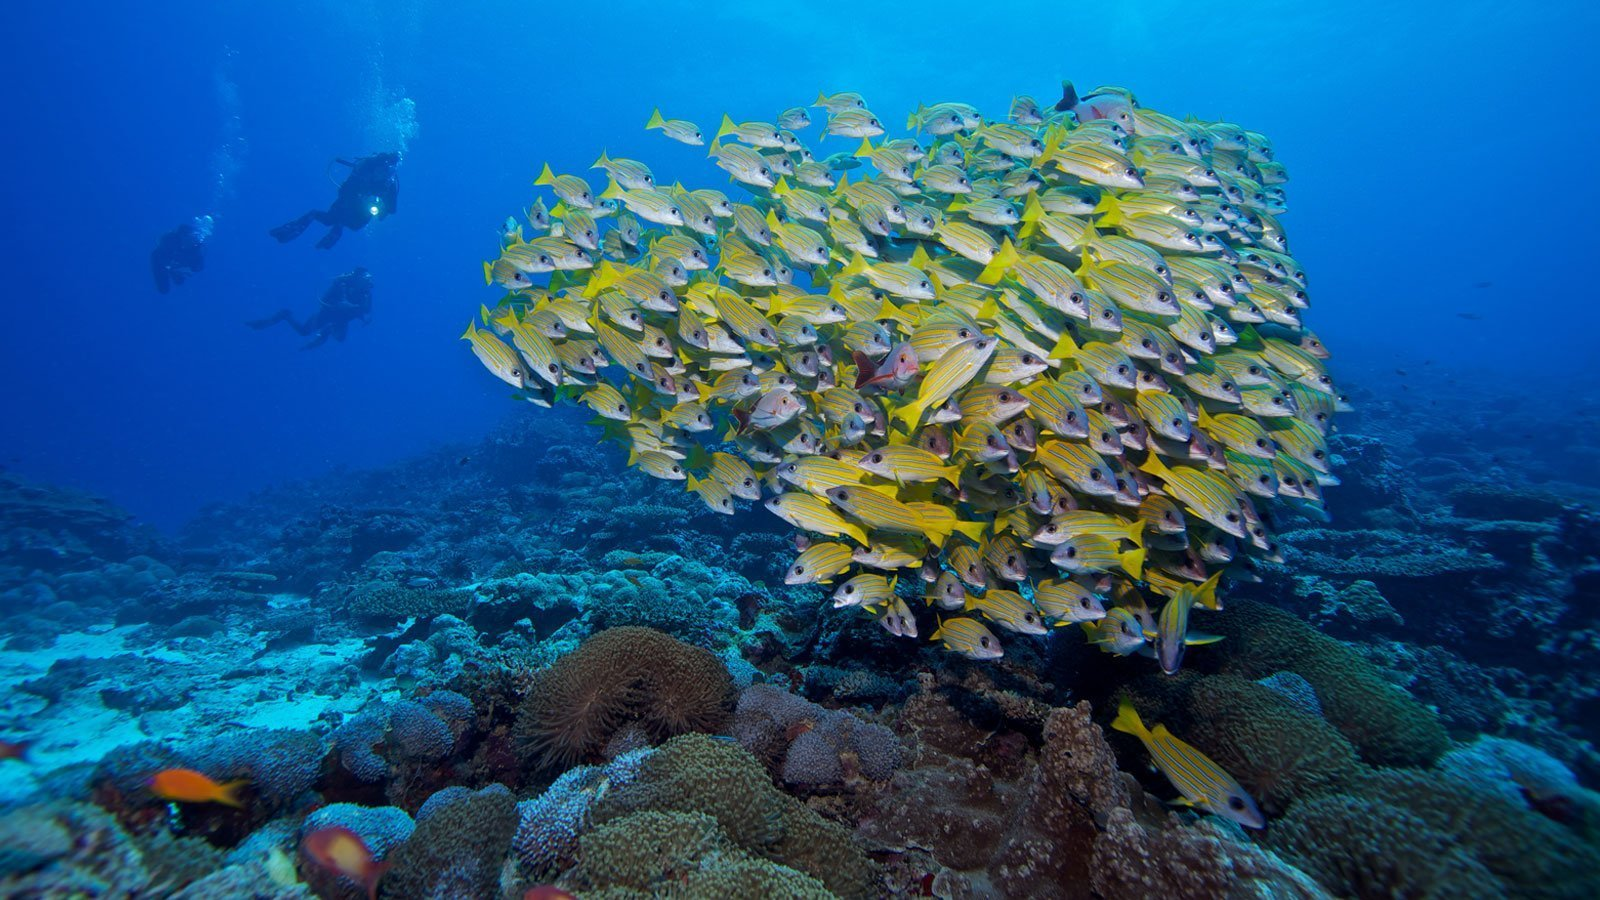 Kuredu Resort Maldives diving packages